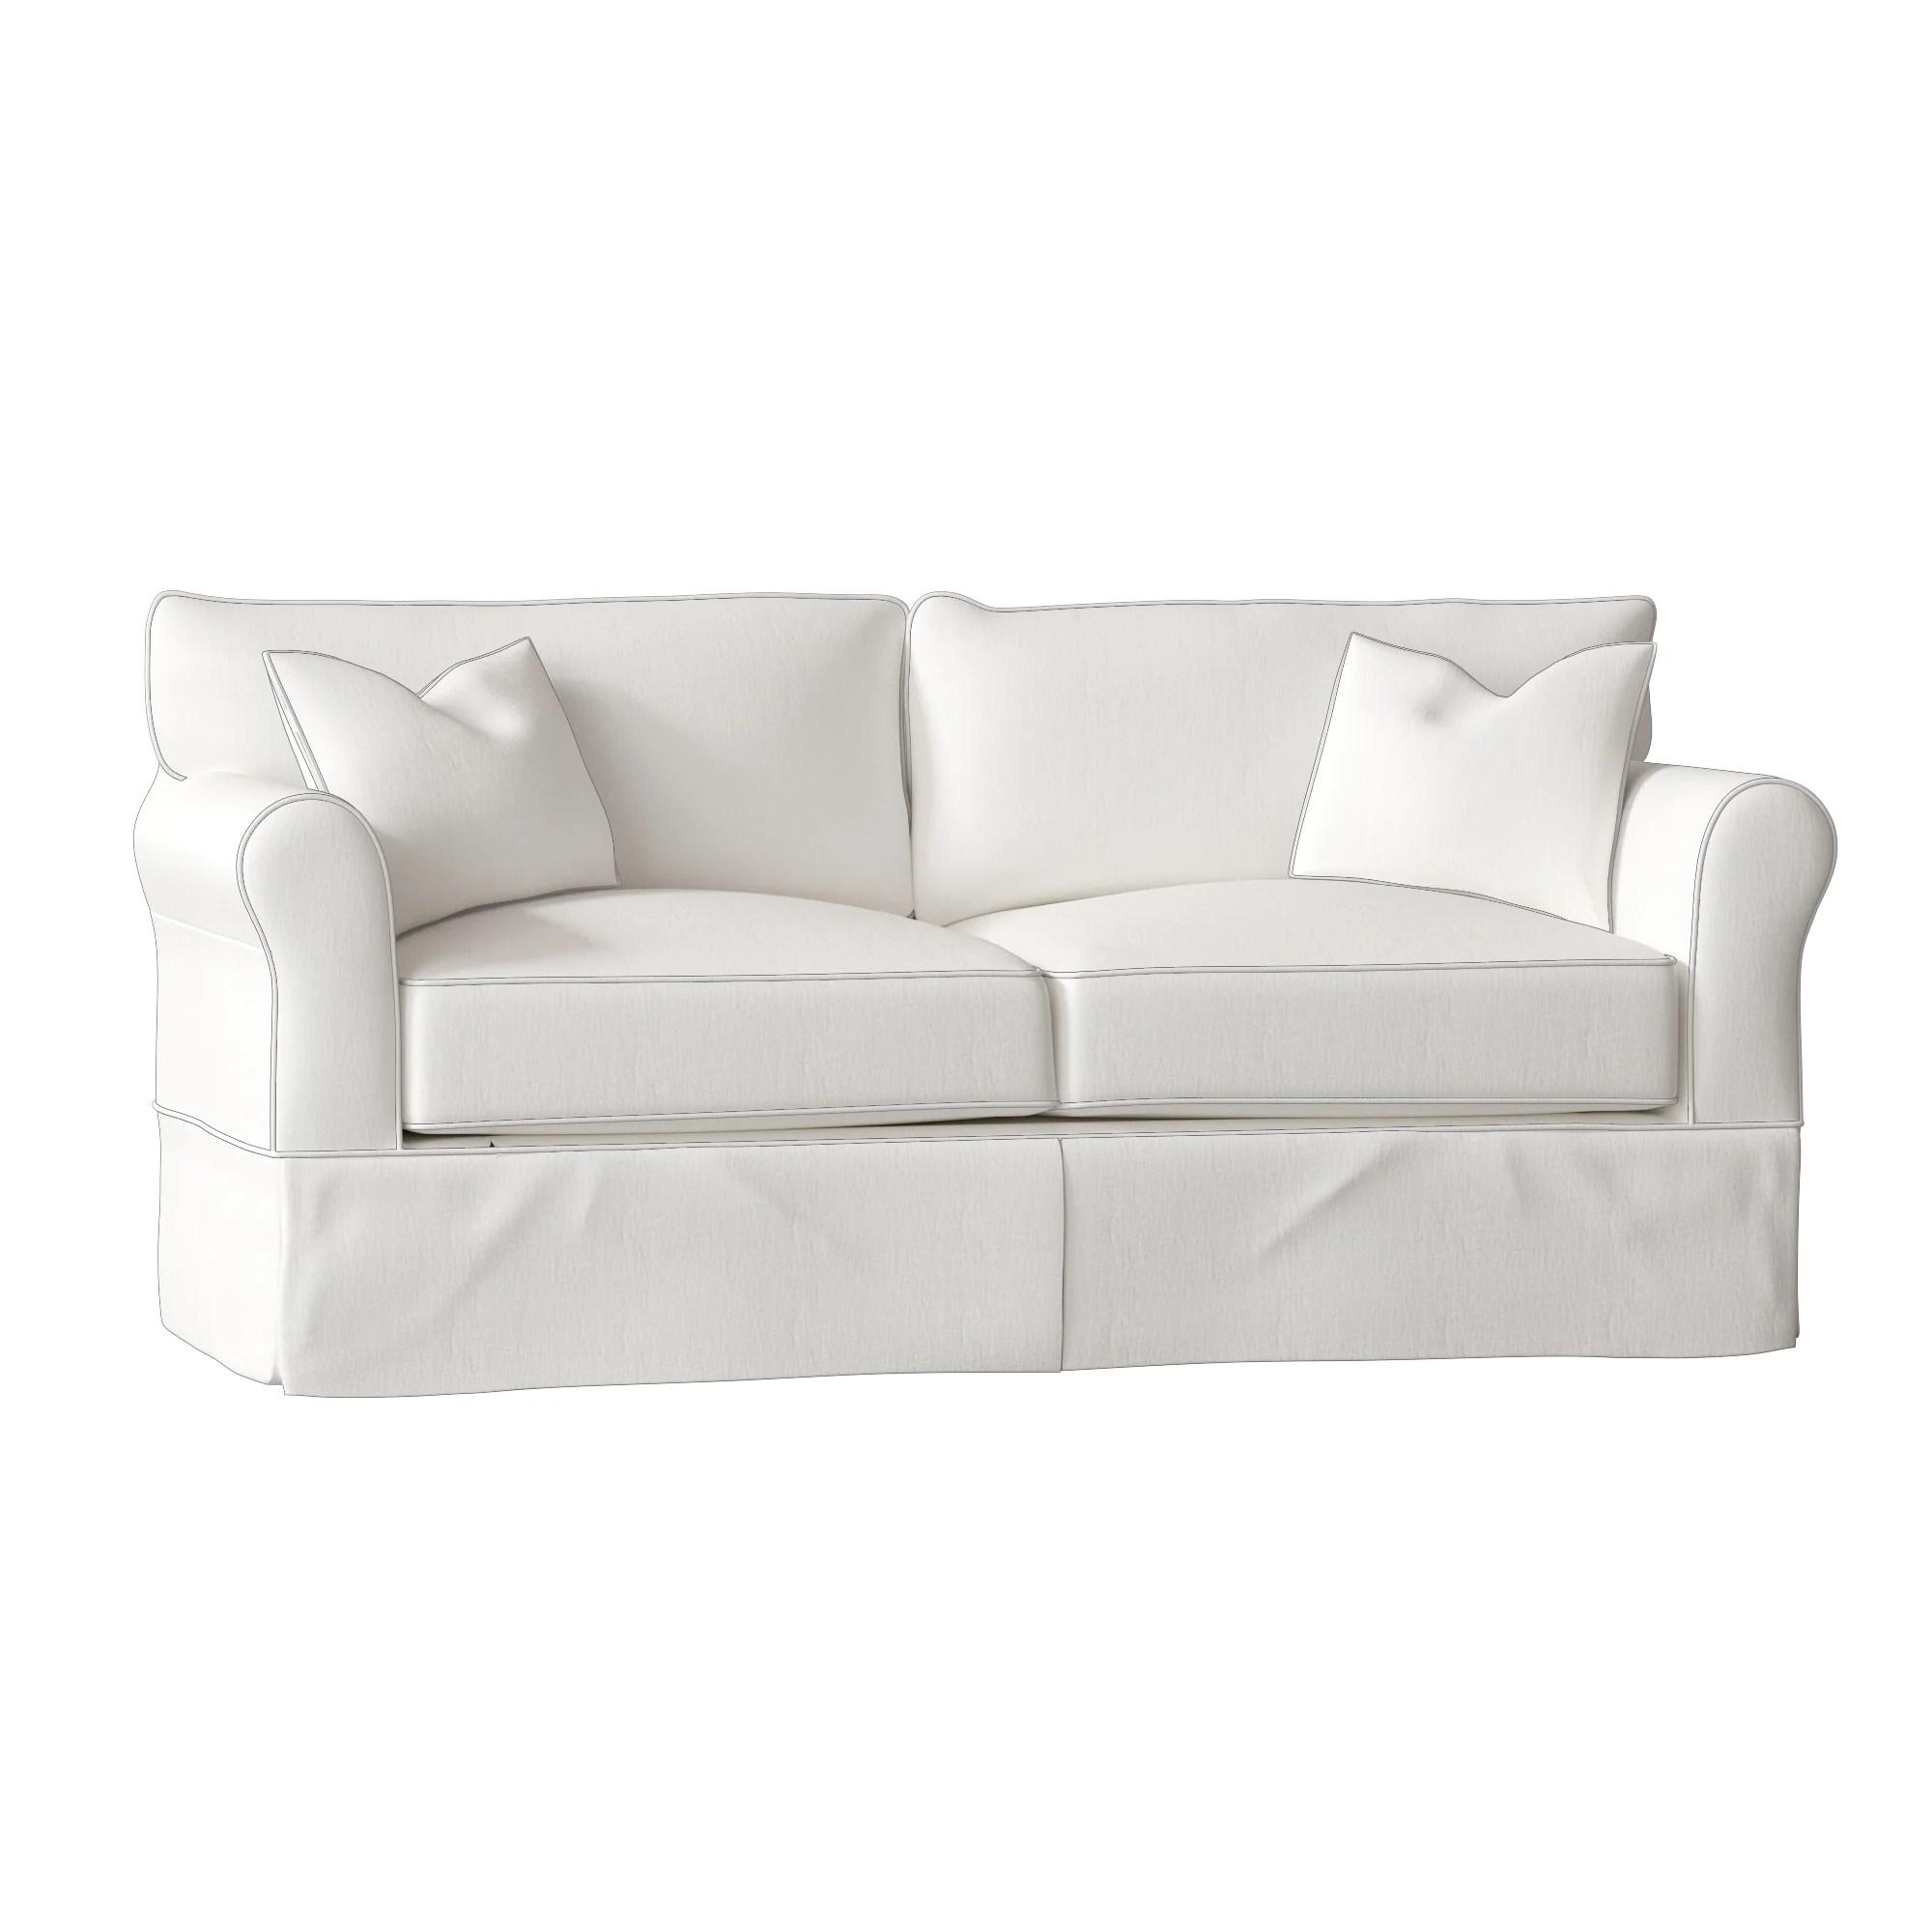 sleeper sofa black friday 2017 cheap cuddle uk wayfair custom upholstery felicity reviews